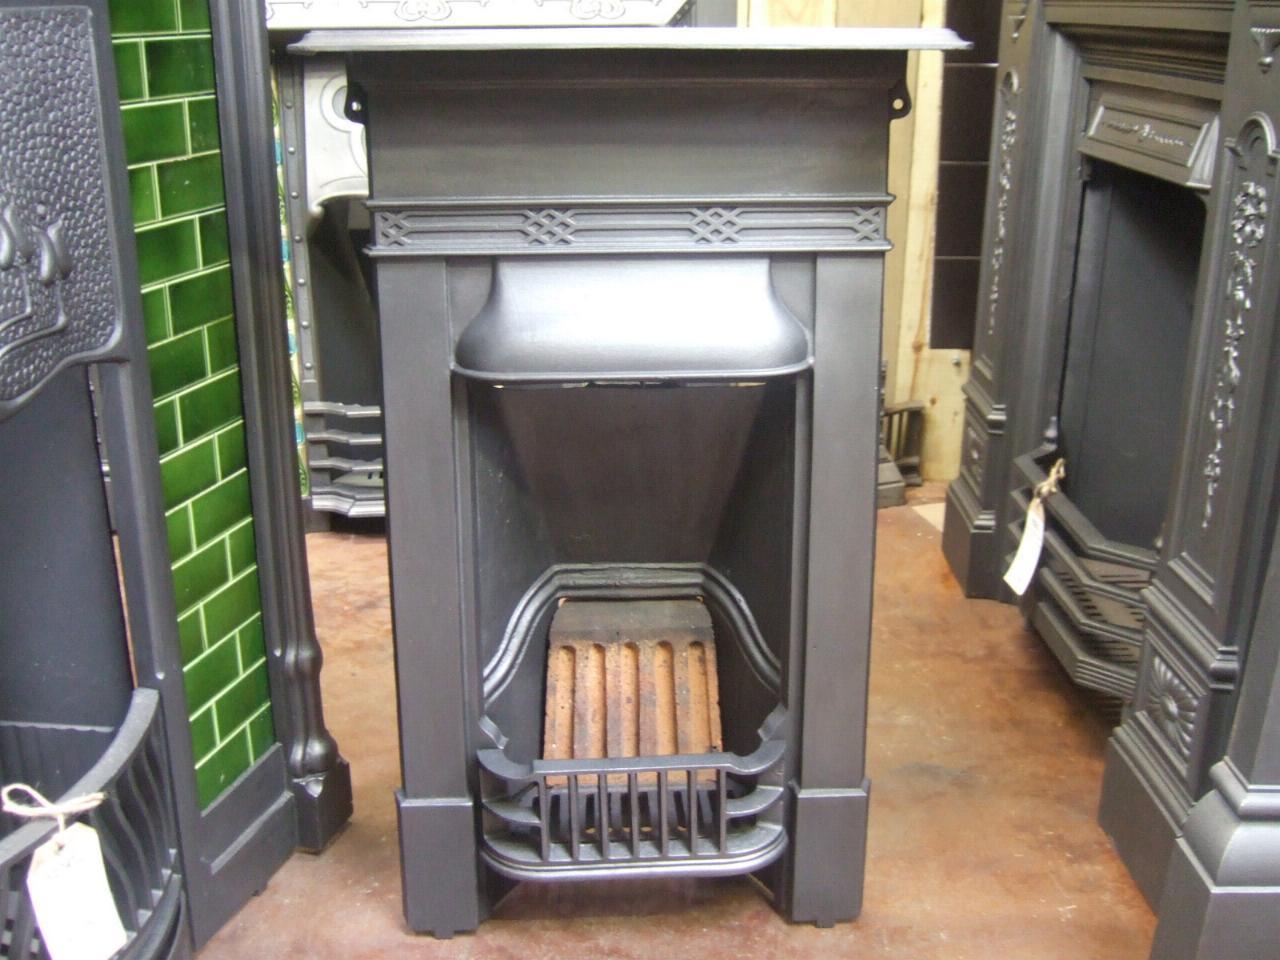 late edwardian bedroom fireplace 097b old fireplaces 097b late edwardian bedroom fireplace